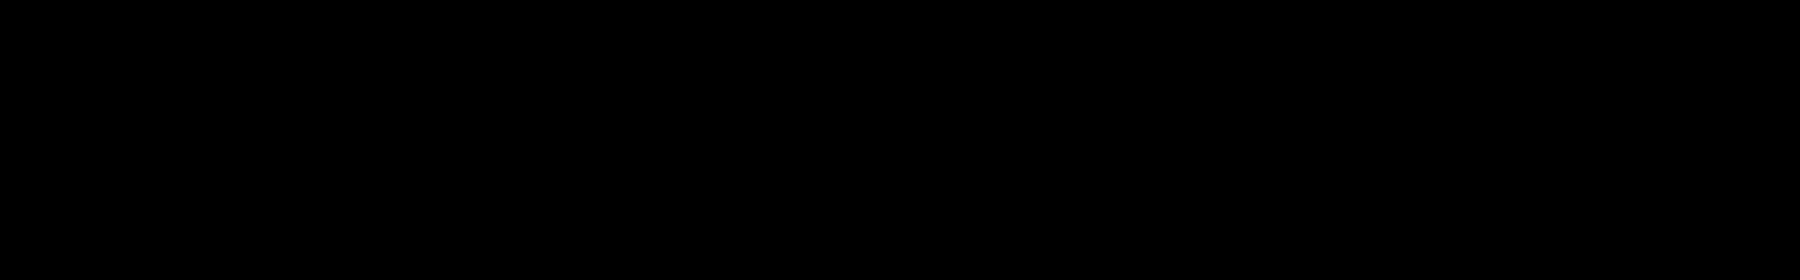 Grunge Melodics audio waveform